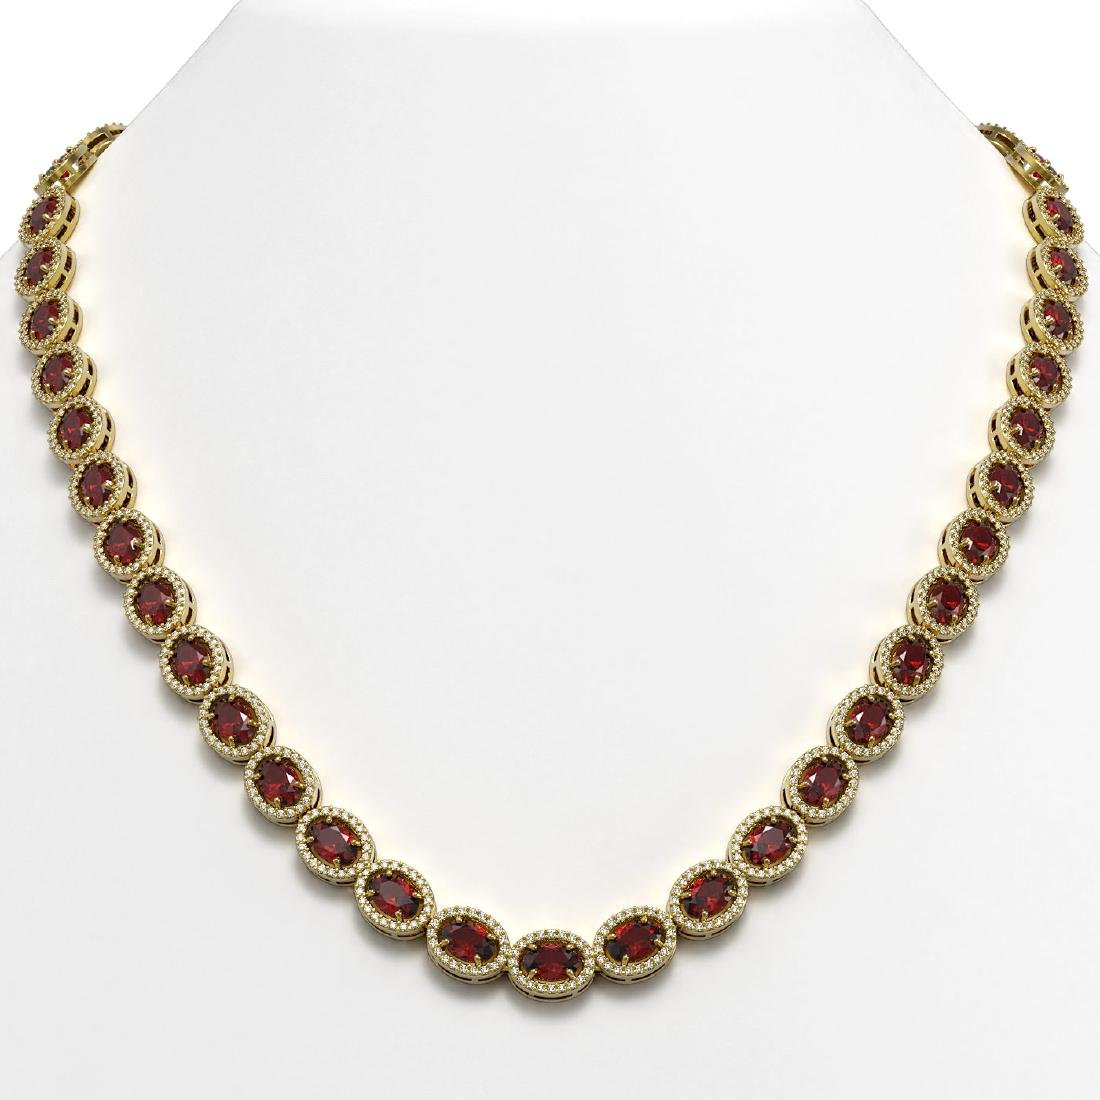 32.82 CTW Garnet & Diamond Halo Necklace 10K Yellow